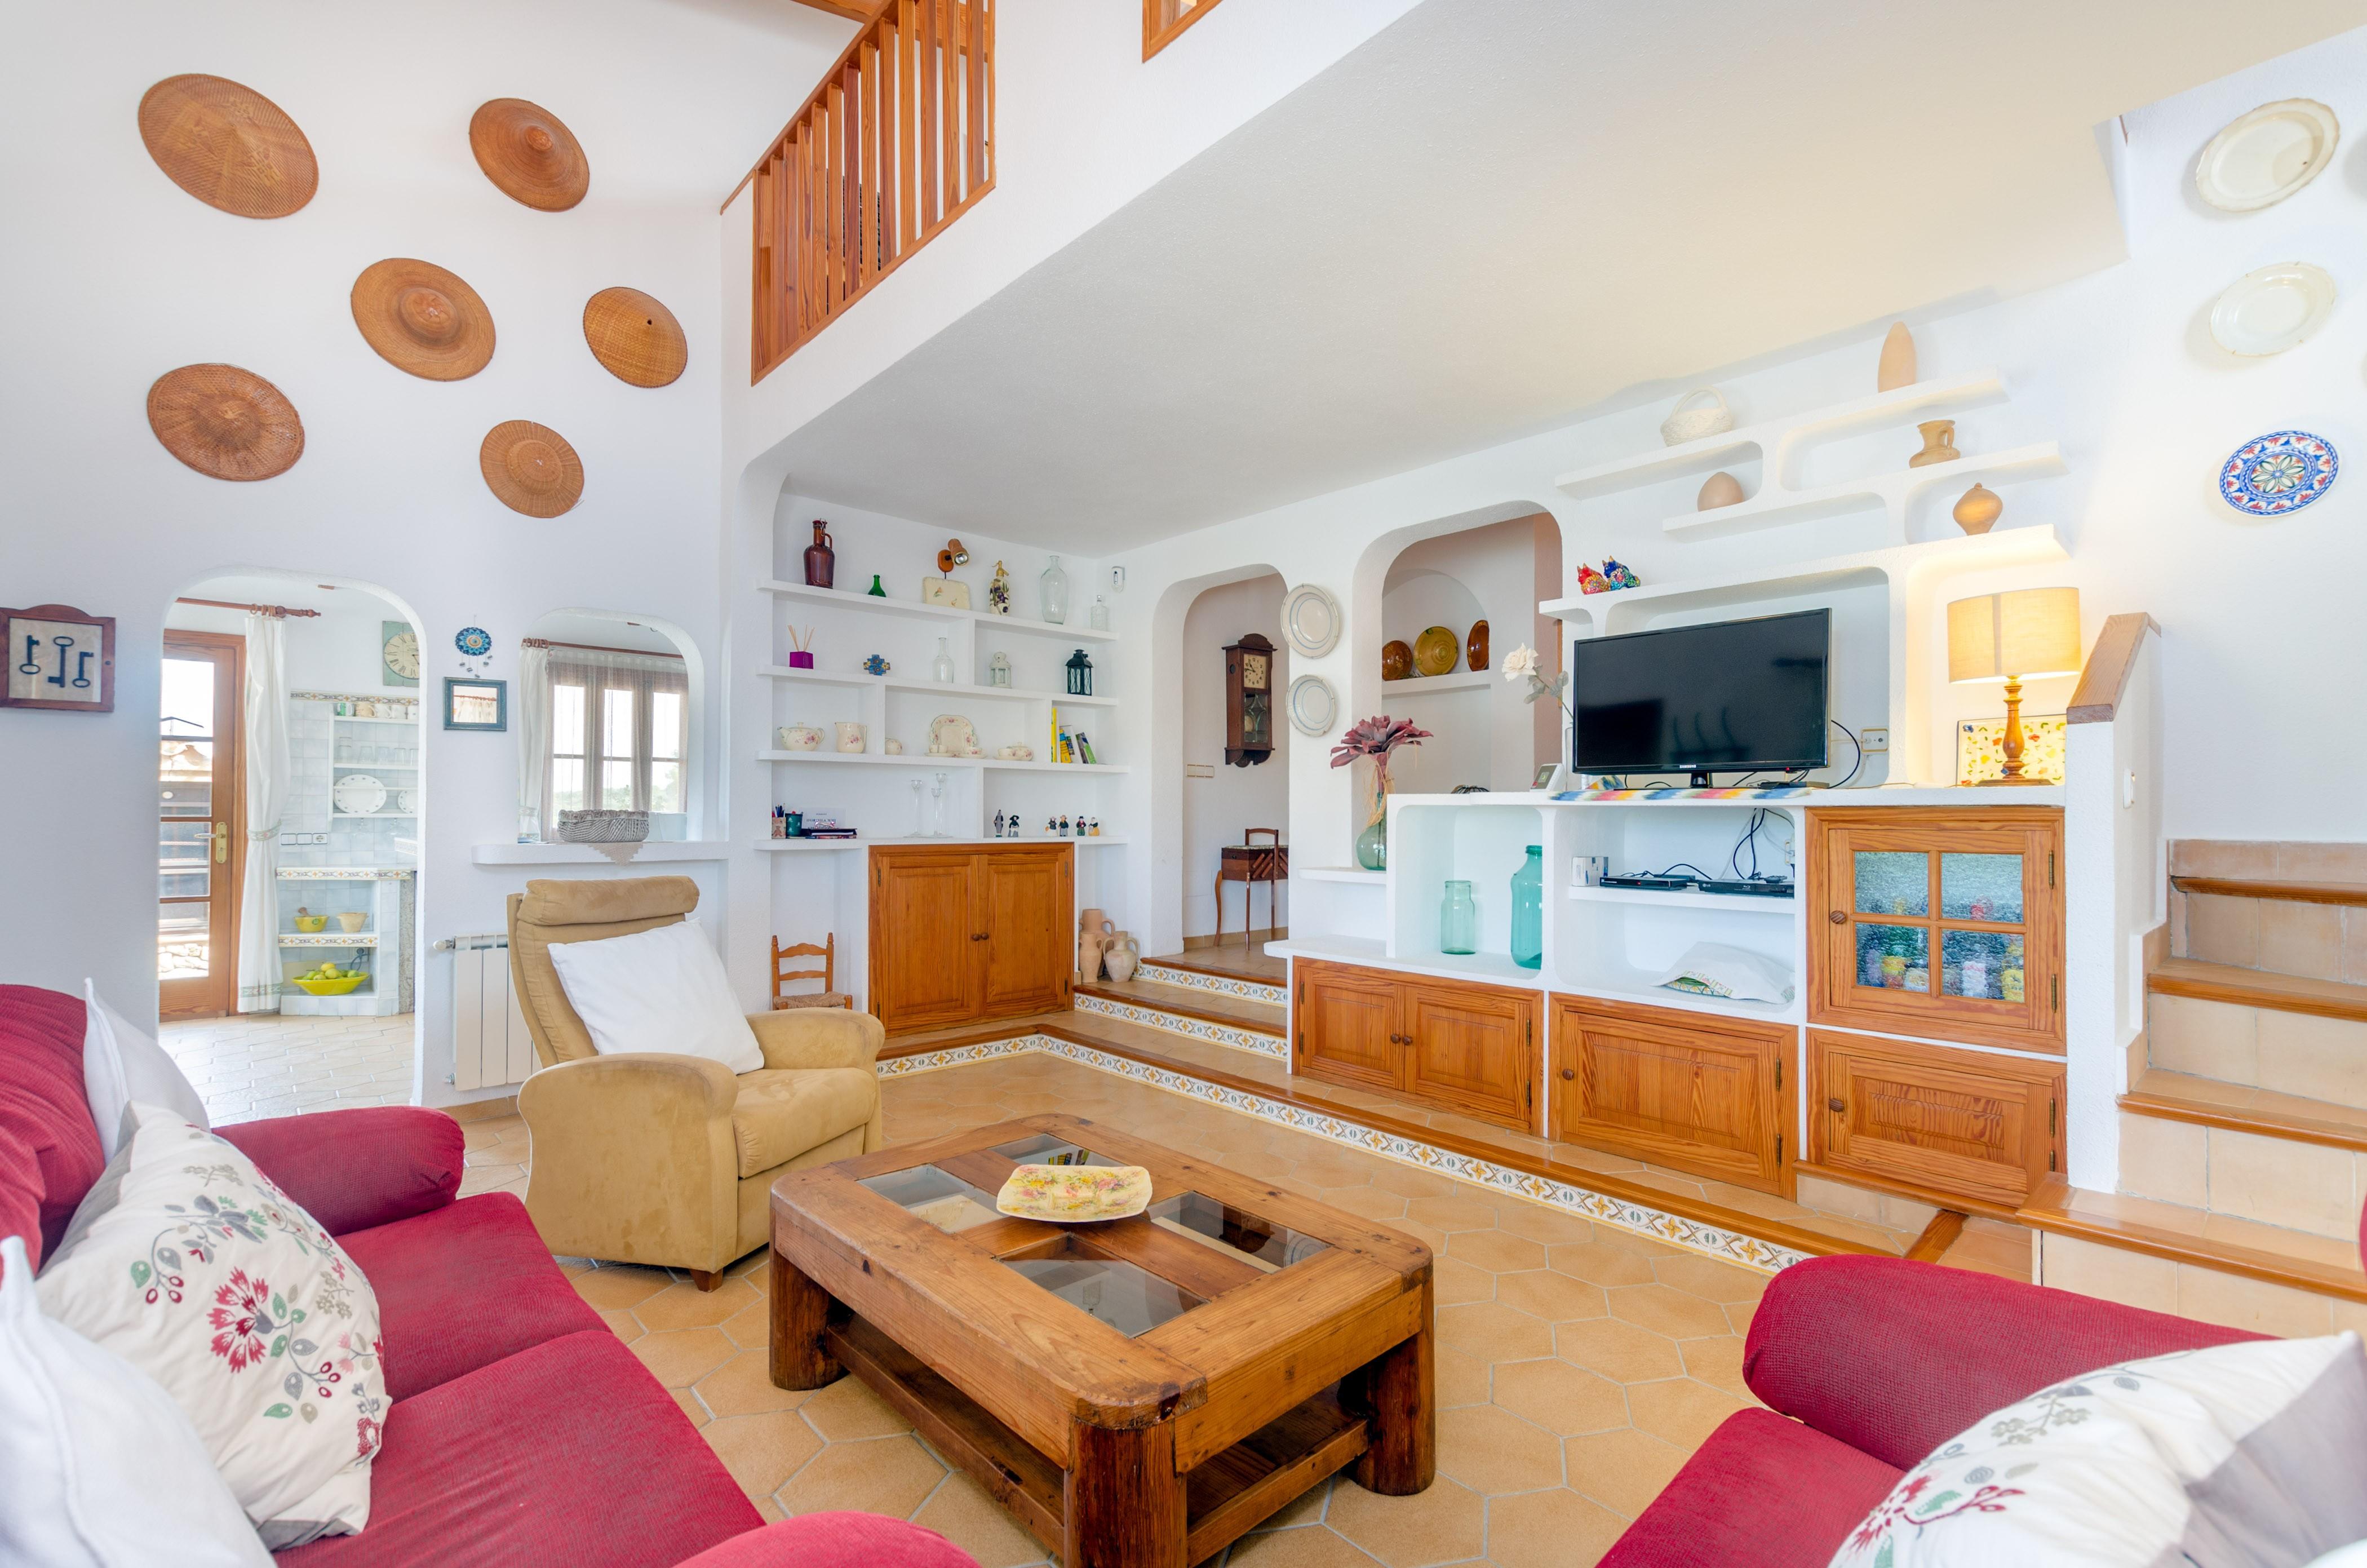 Maison de vacances SA SINIA (2374876), Lloret de Vistalegre, Majorque, Iles Baléares, Espagne, image 15